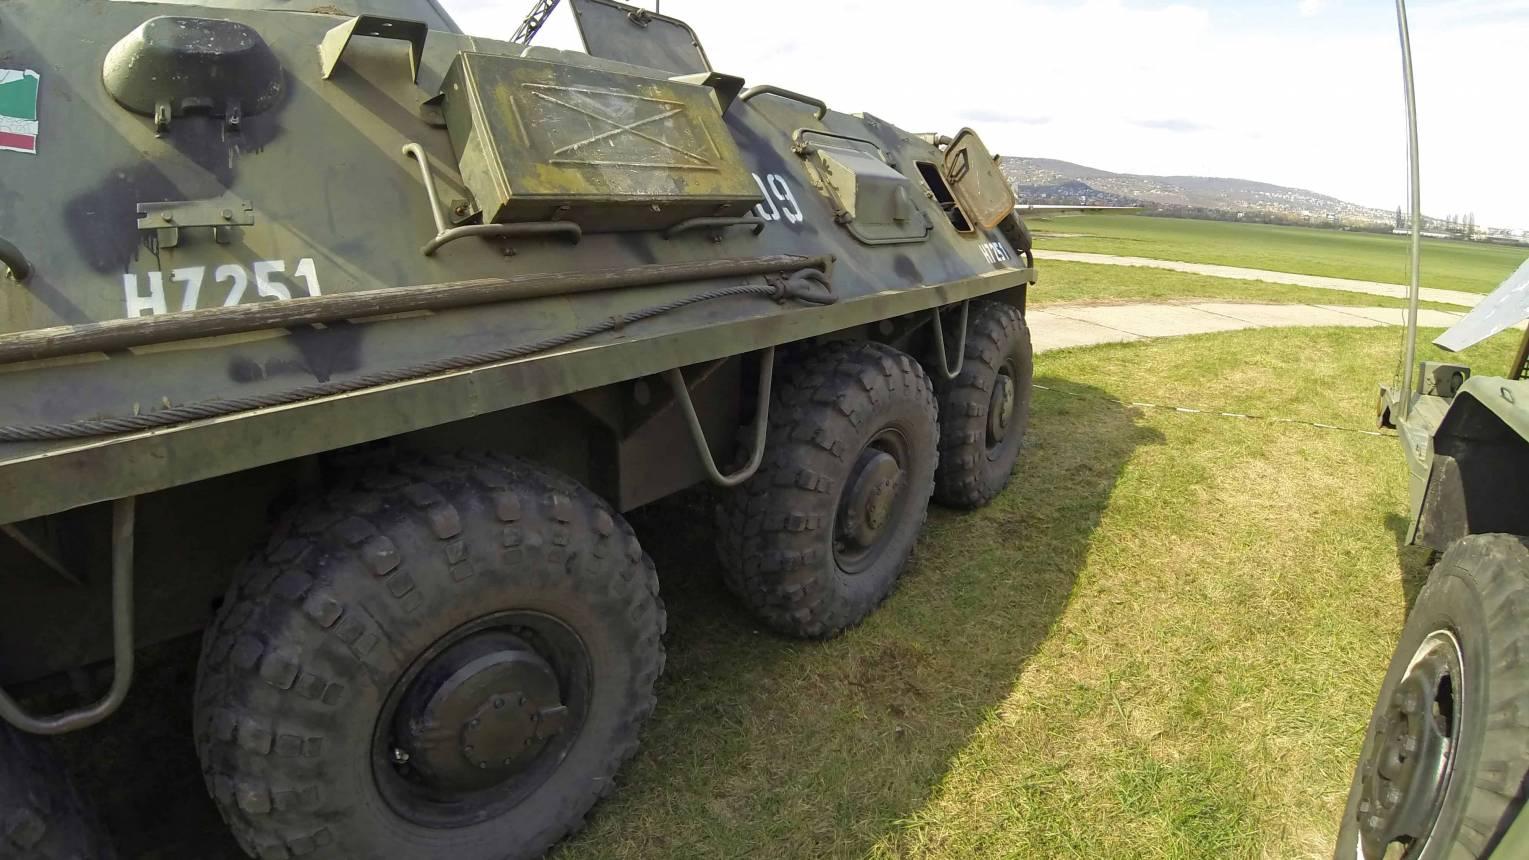 BTR-60 katonai jármű vezetés